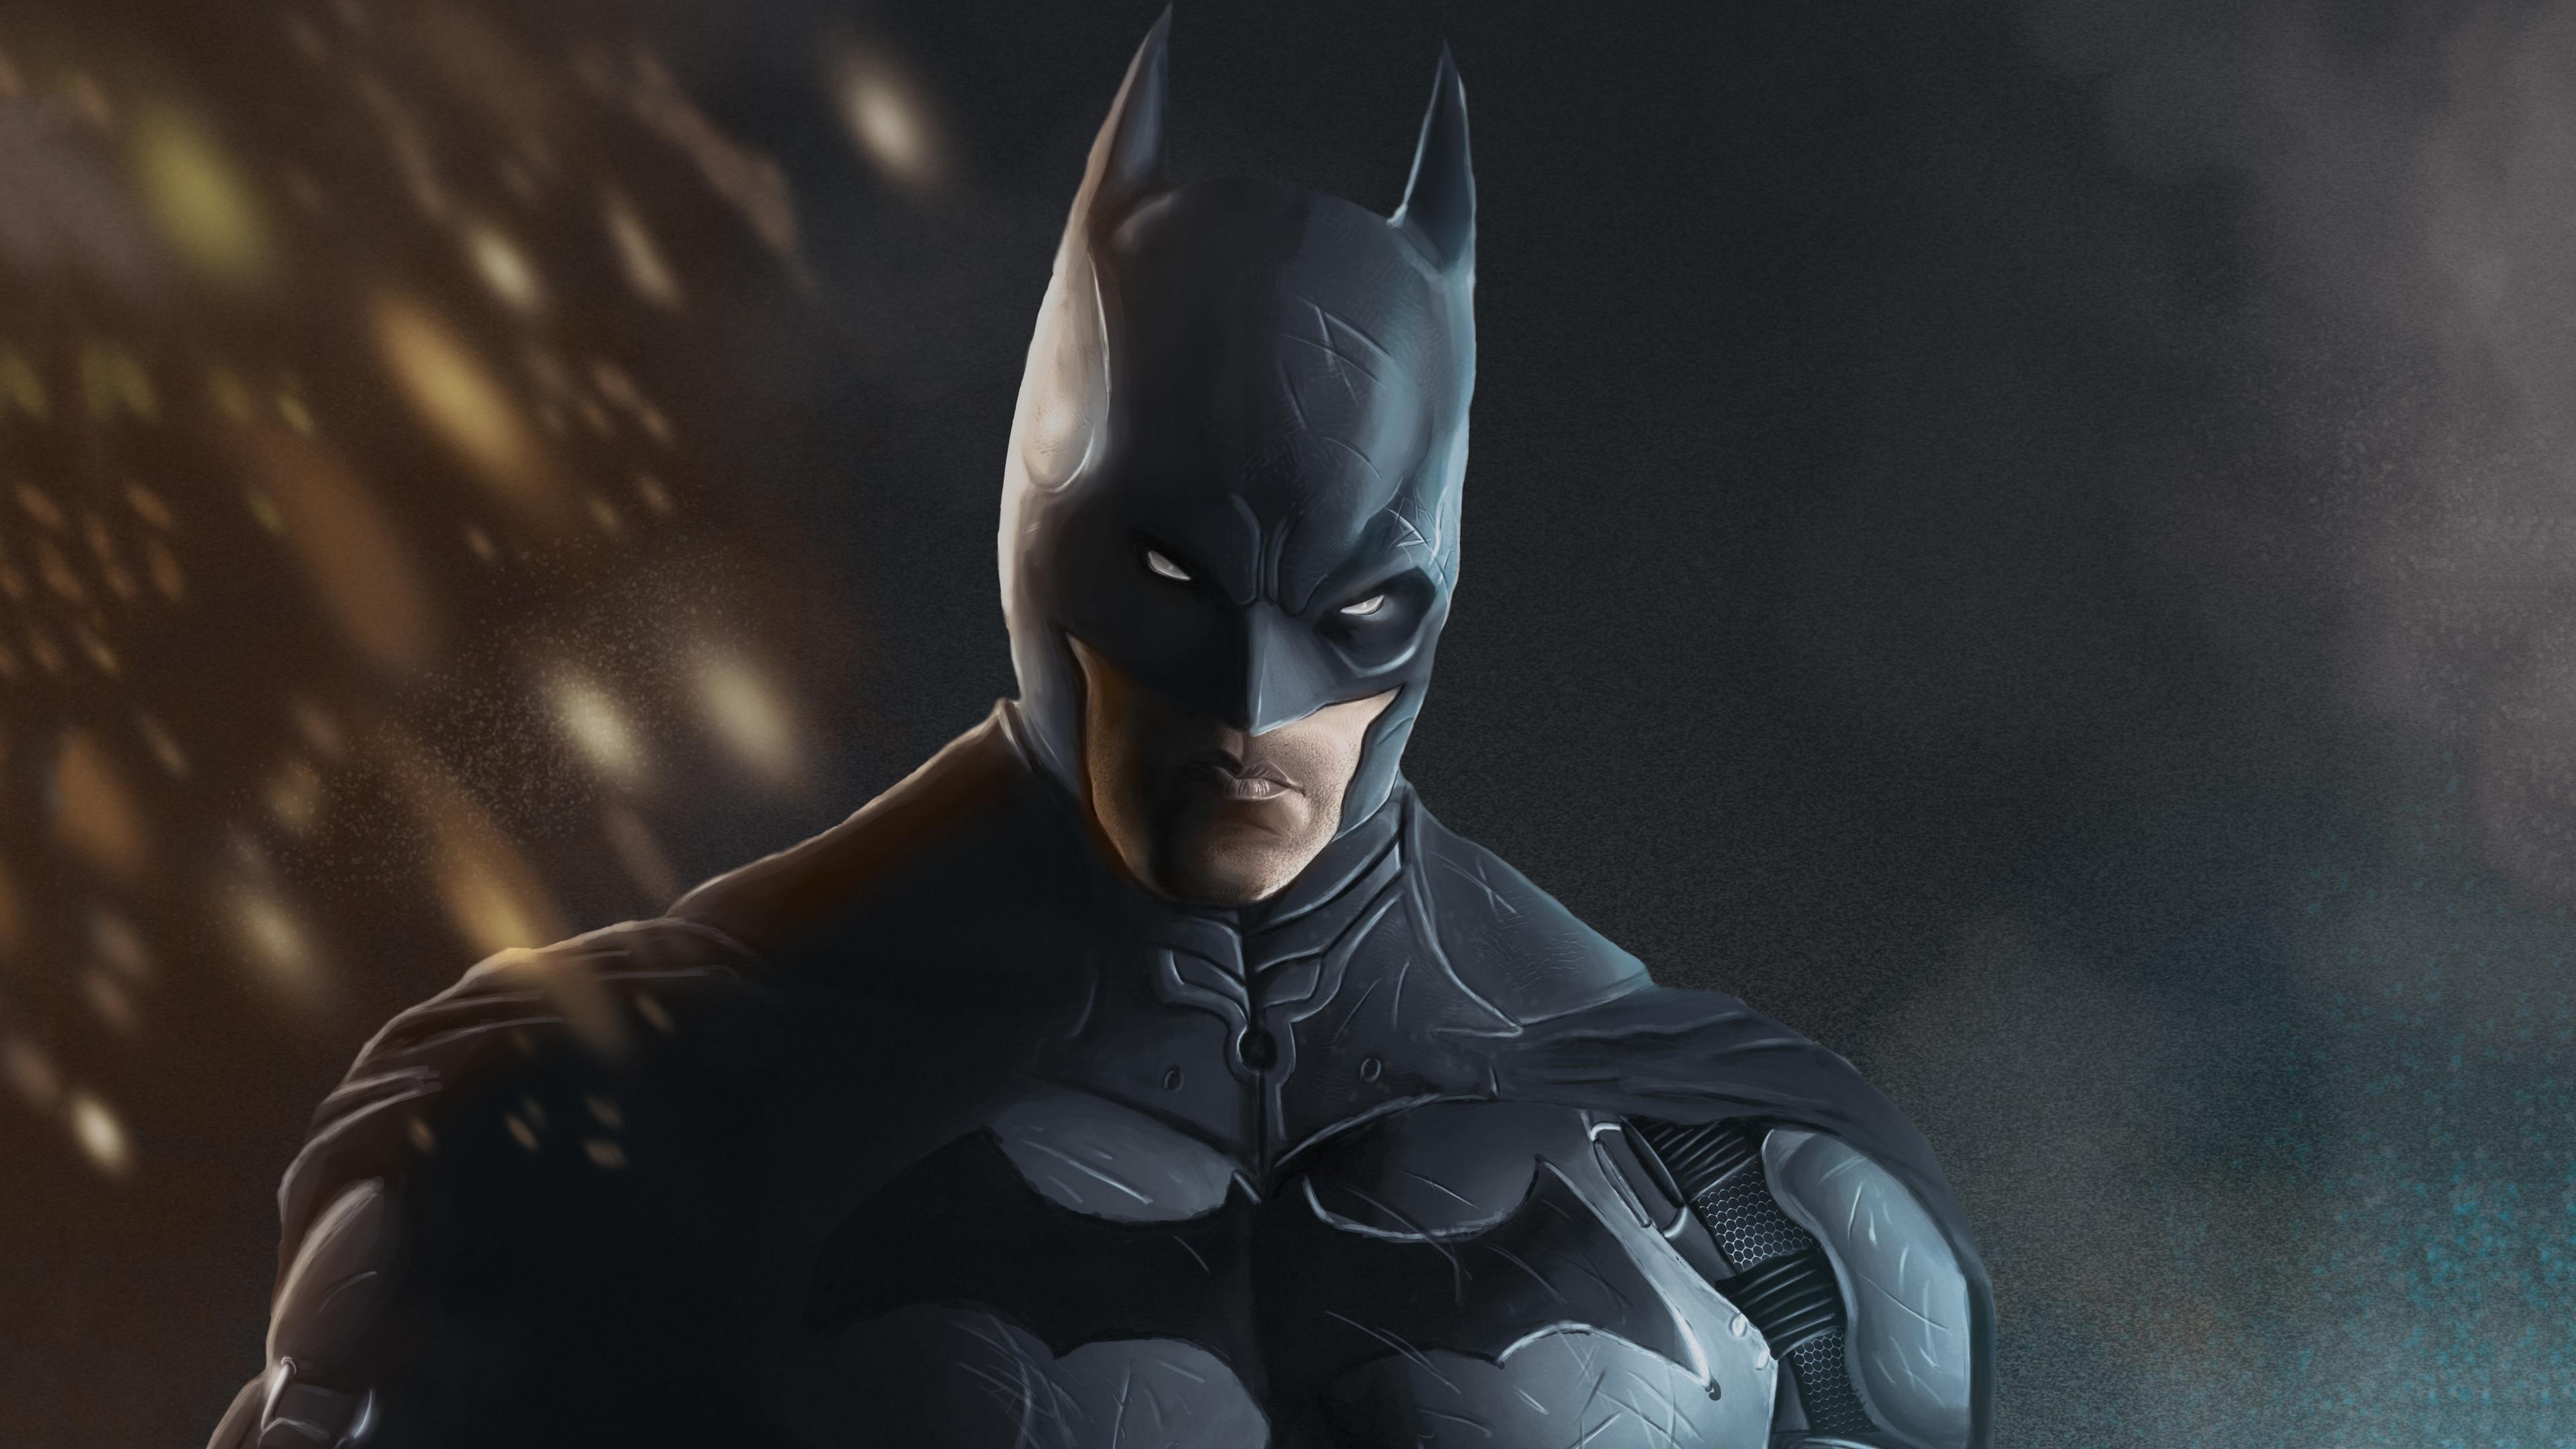 Wallpaper 4k Batman Arkham Knight 5k 4k Wallpapers 5k Wallpapers